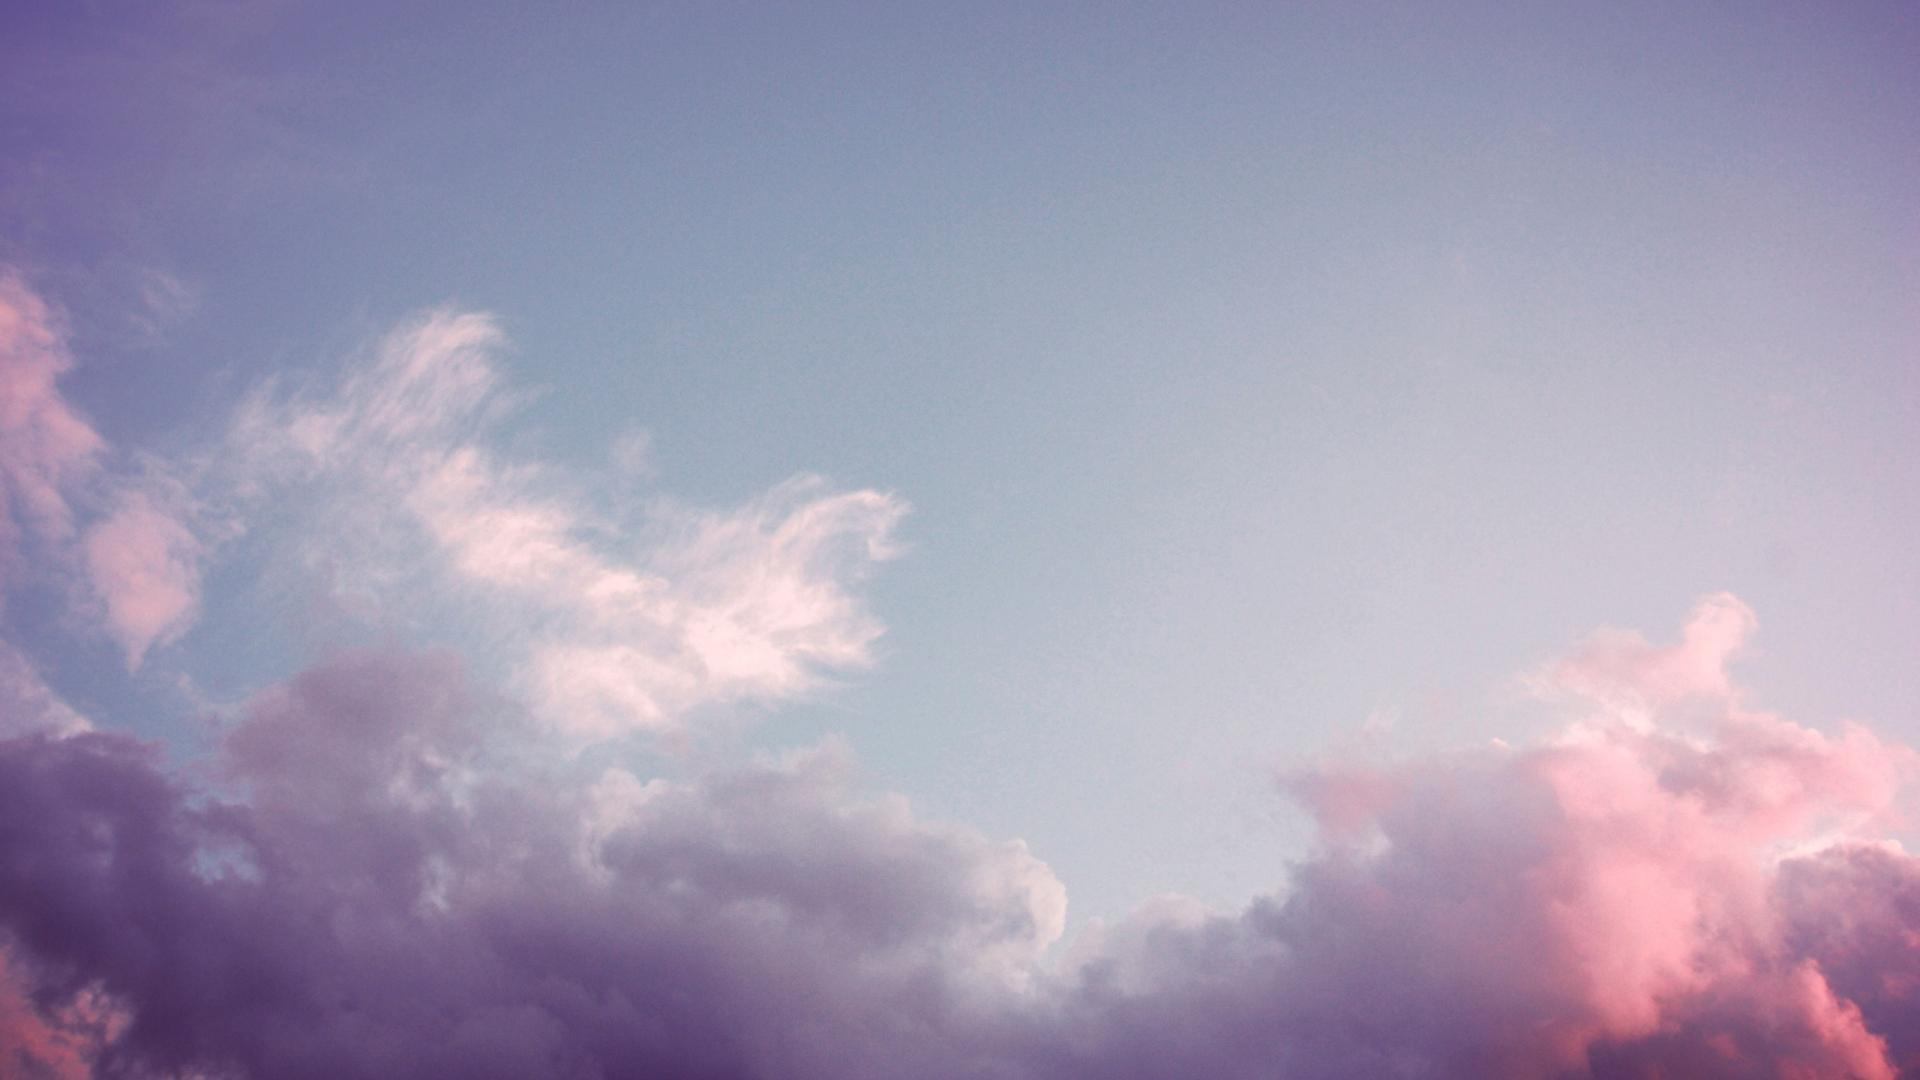 Sky Clouds Wallpaper wallpaper   964278 1920x1080